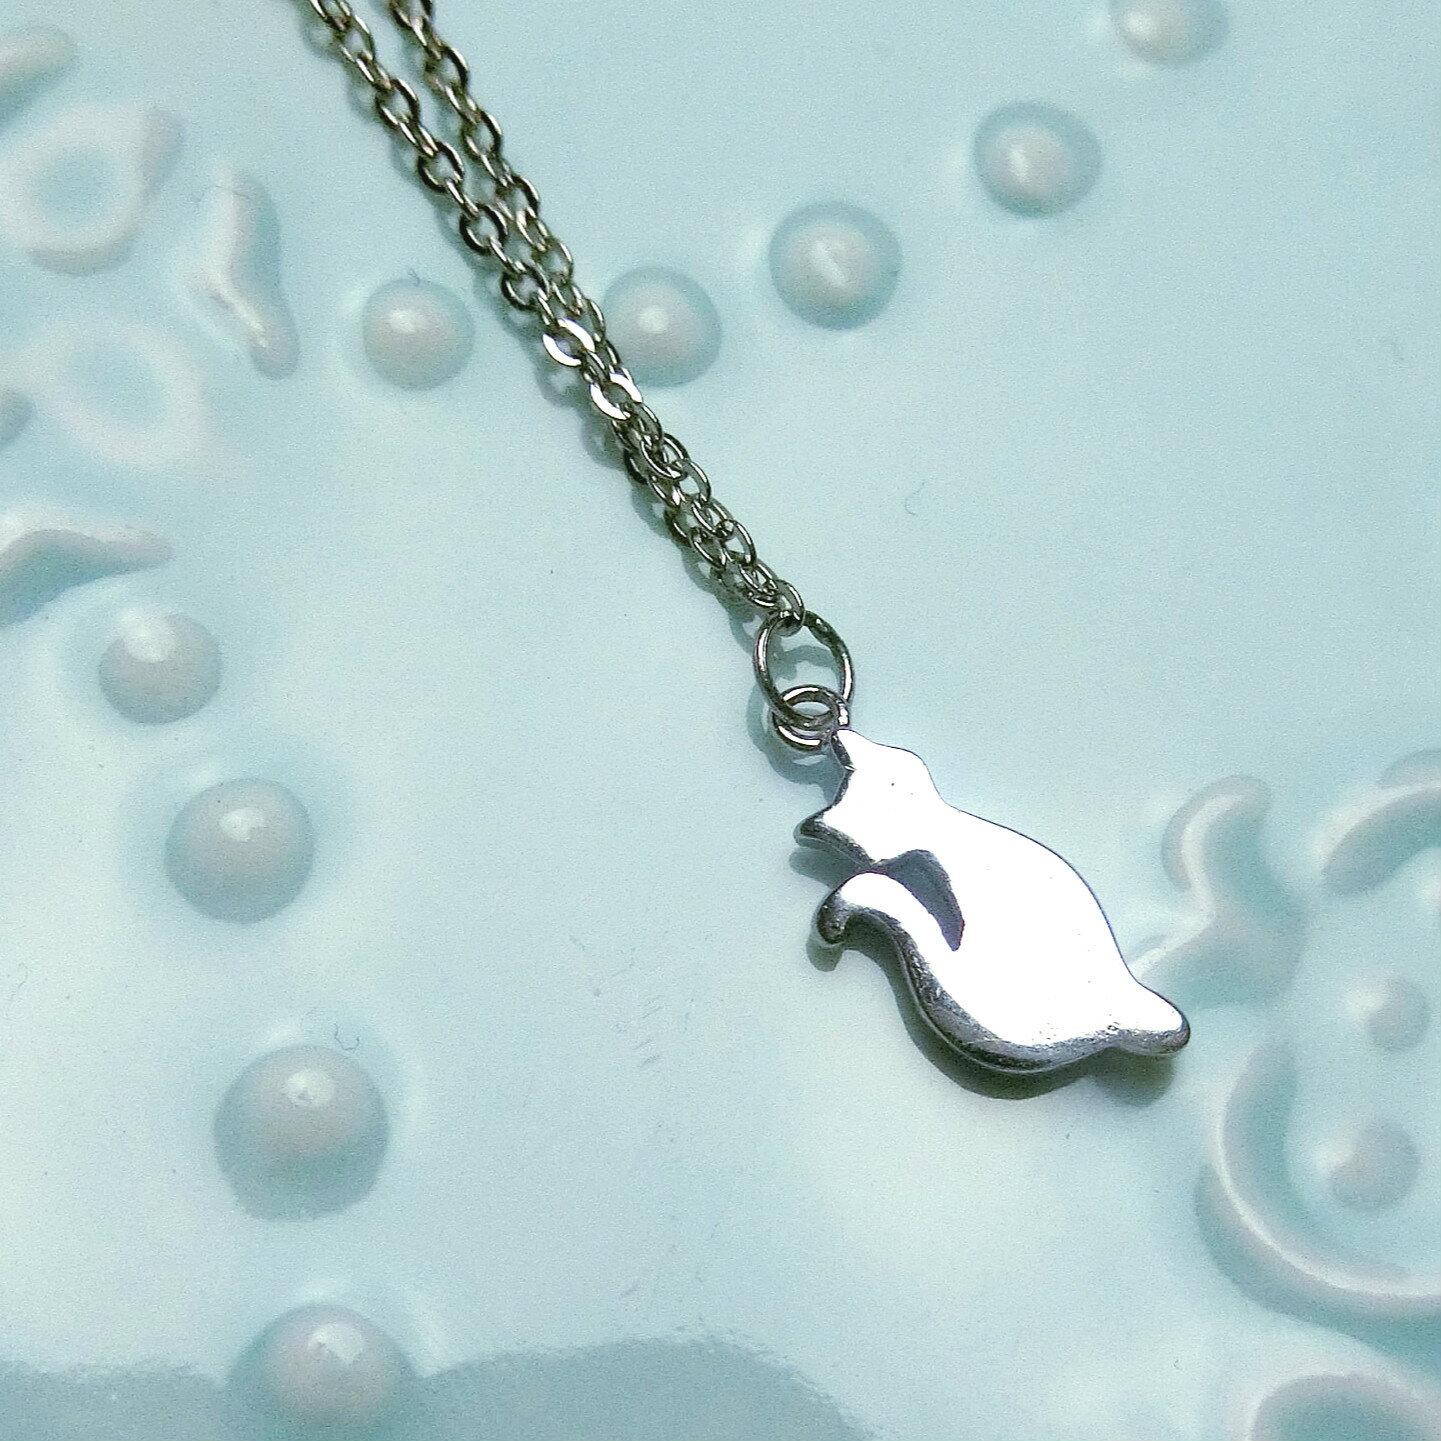 Tokyo Alice 純銀平面貓咪項鍊^(銀色^),項鏈飾品首飾銀飾甜美鎖骨鏈^(s00